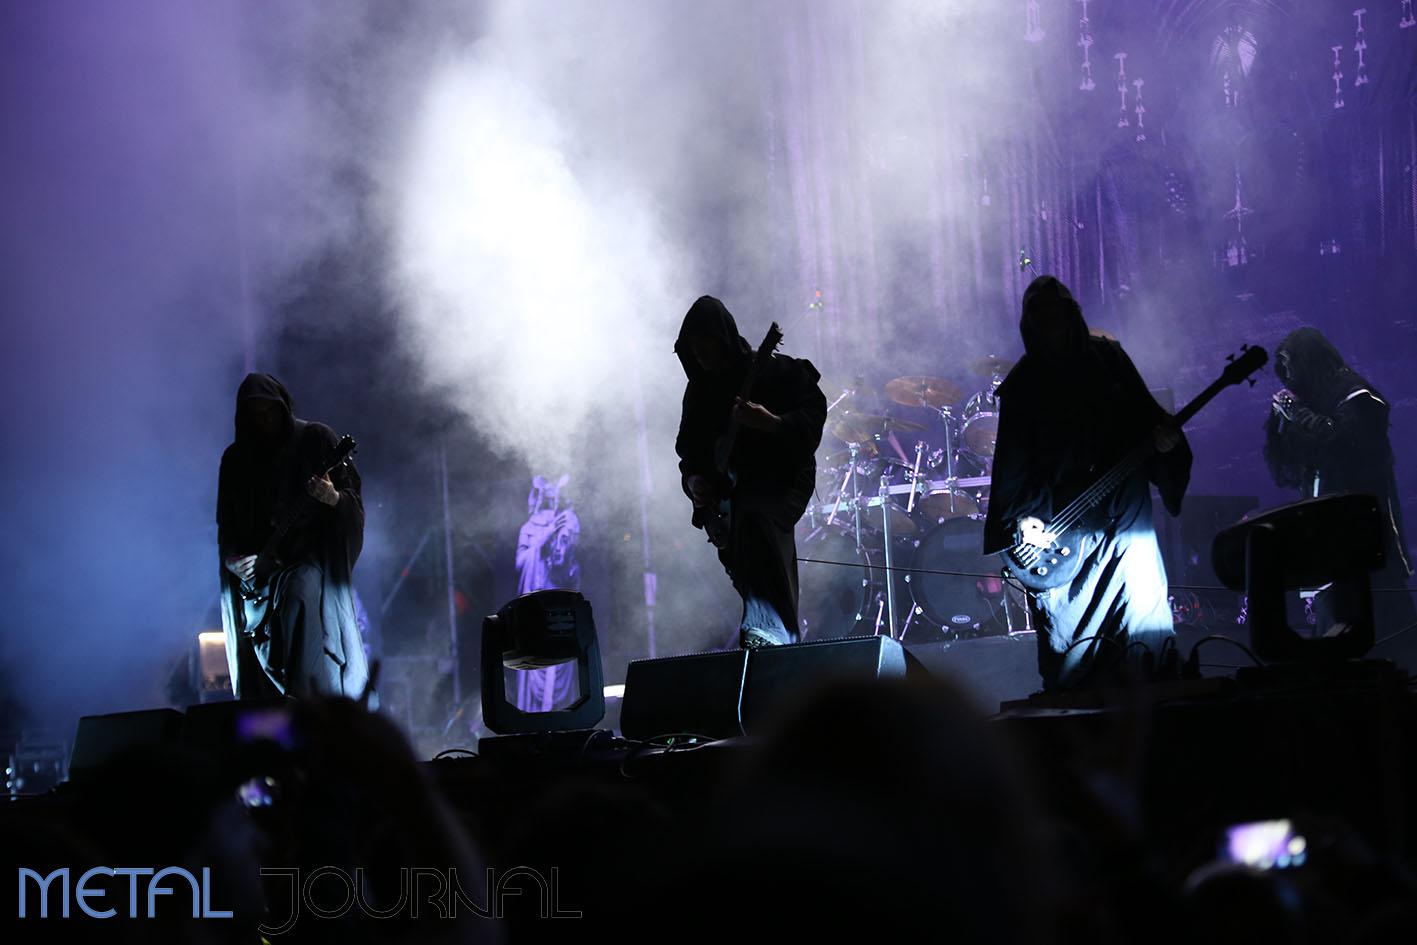 mayhem metal journal rock the coast 2019 pic 2